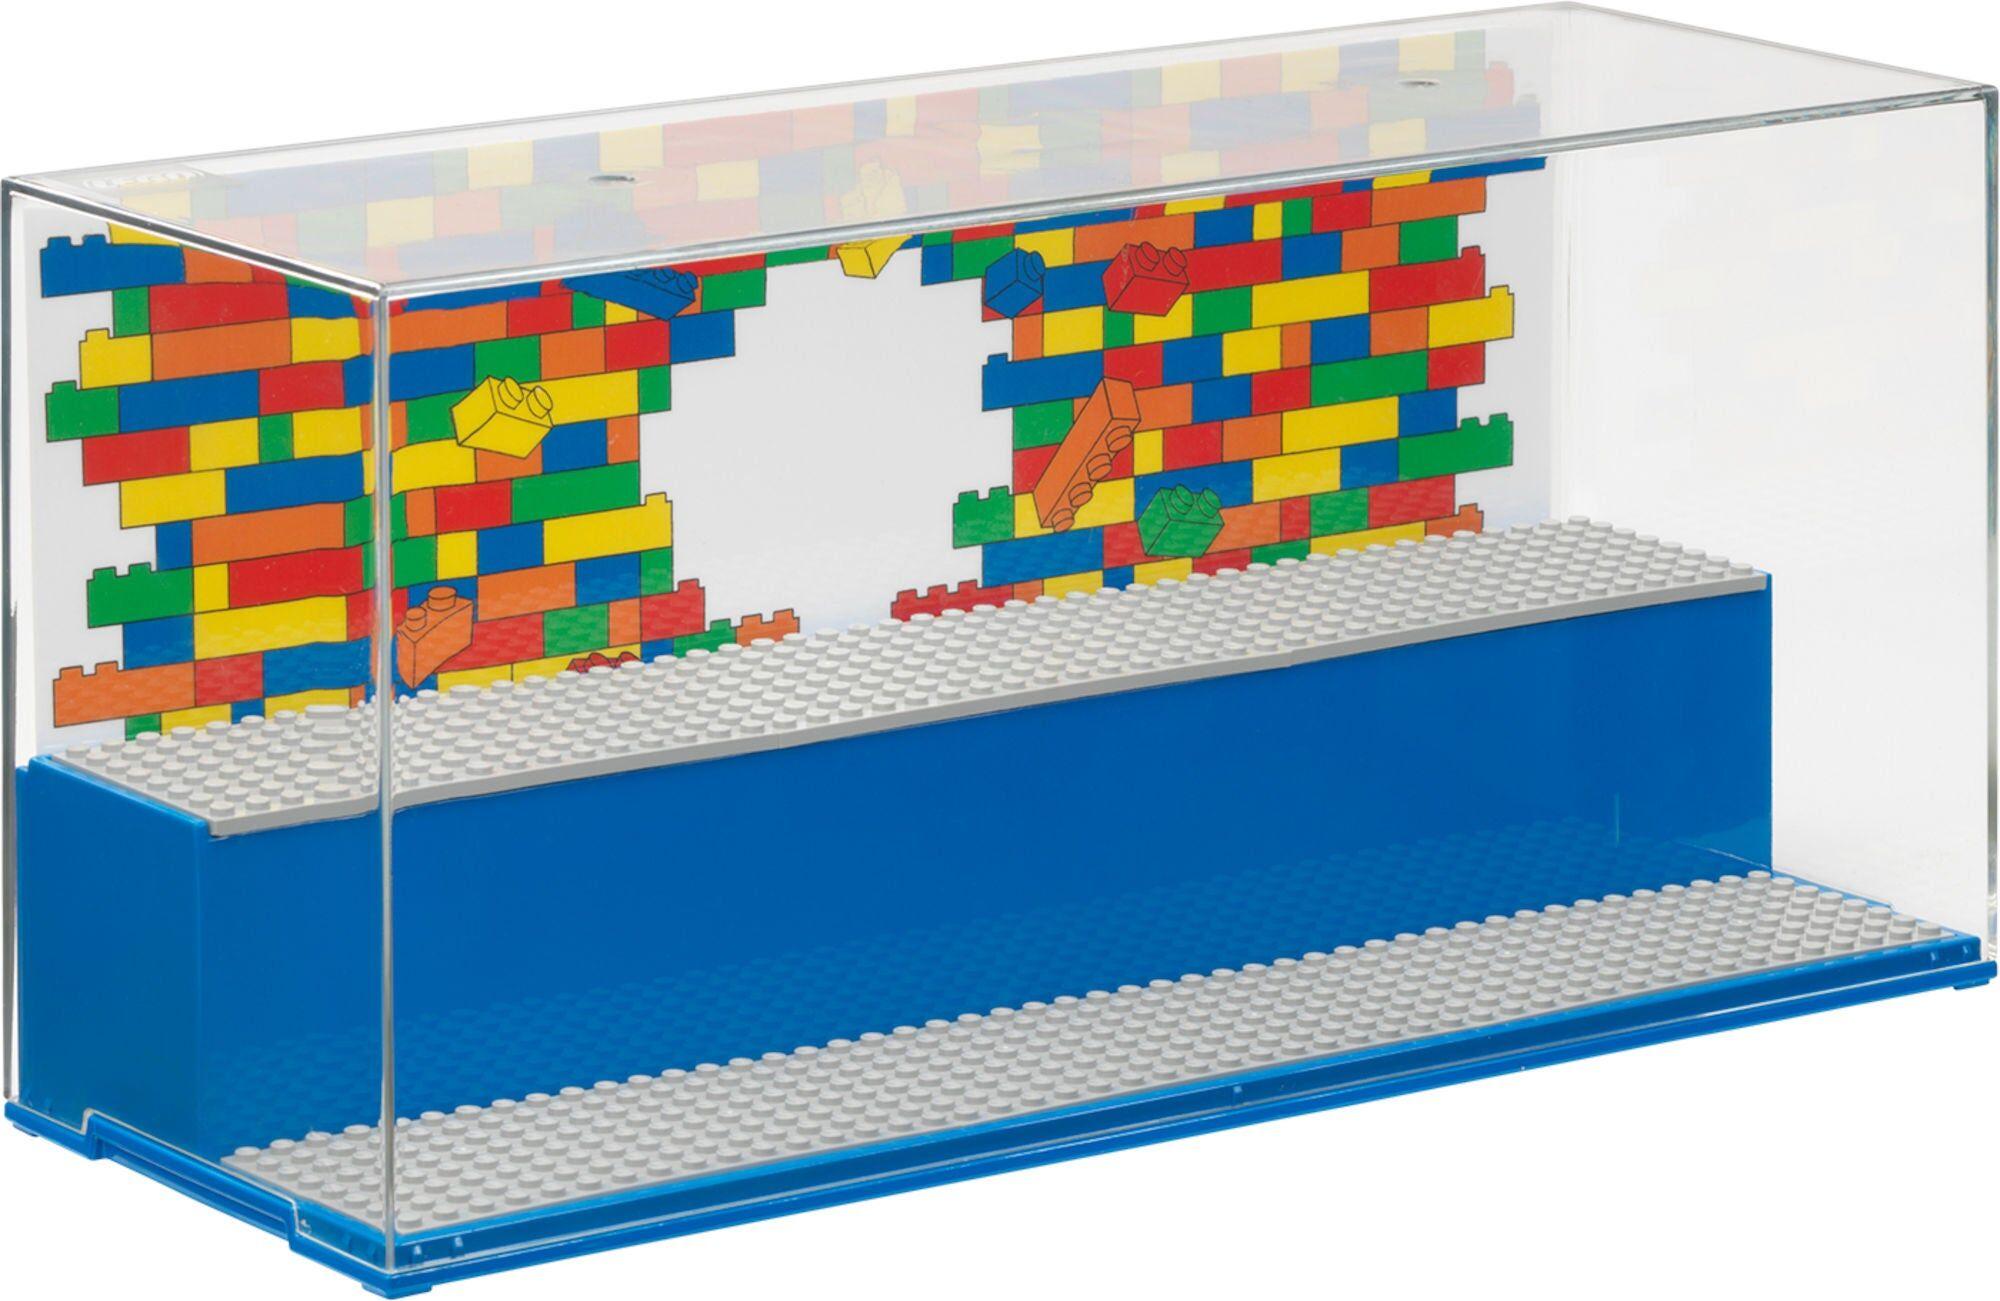 Lego Displaybox, Blå